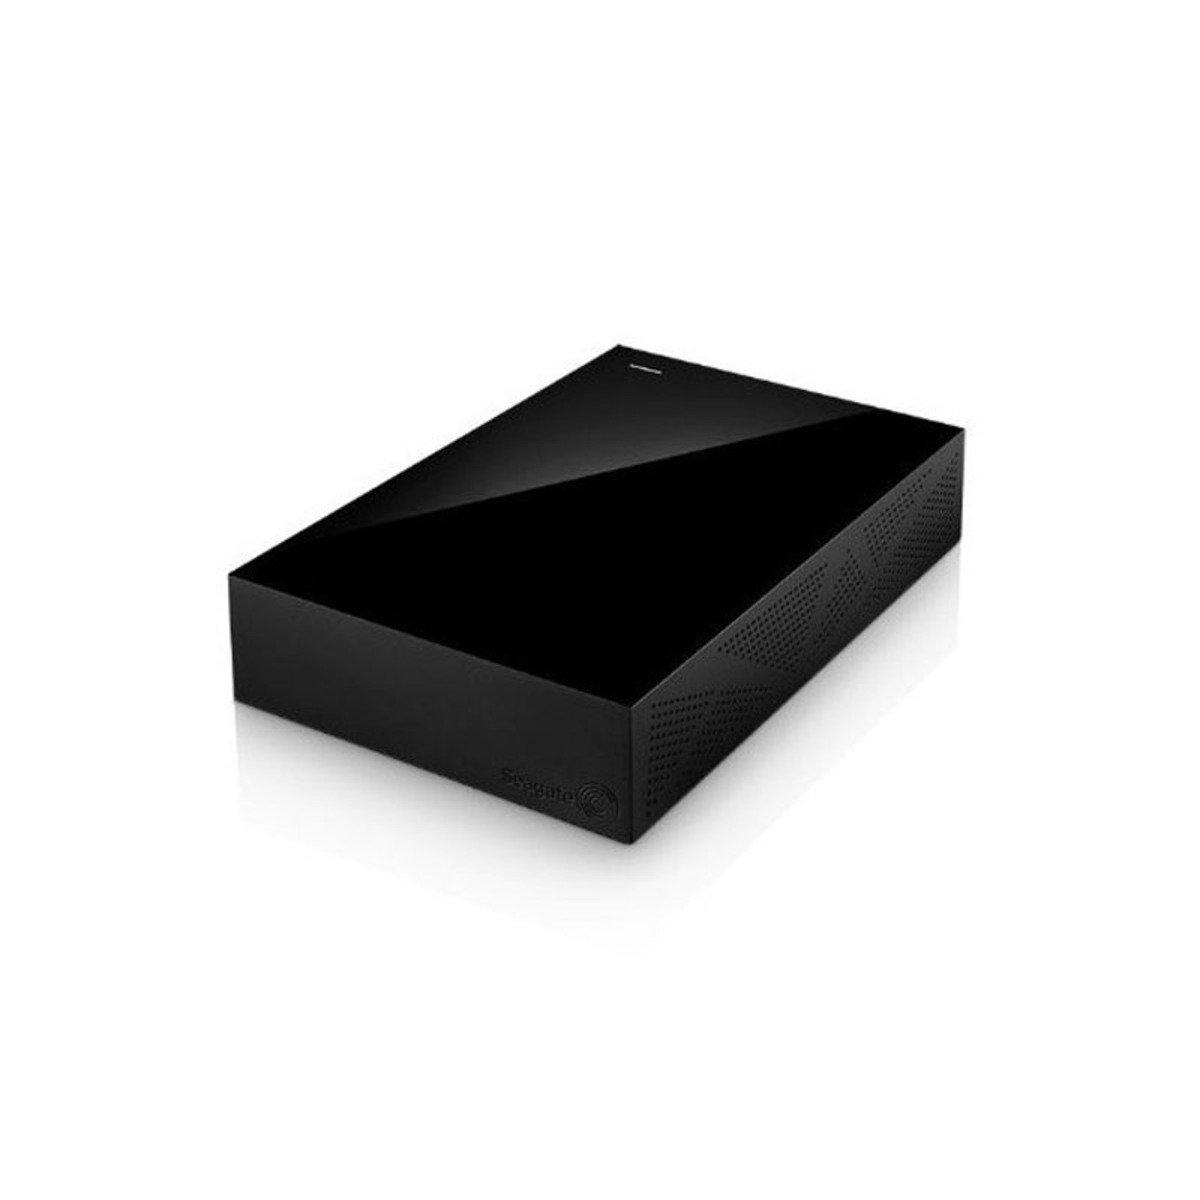 Backup Plus 4TB USB 3.0 3.5吋 外置硬碟 STDT4000300